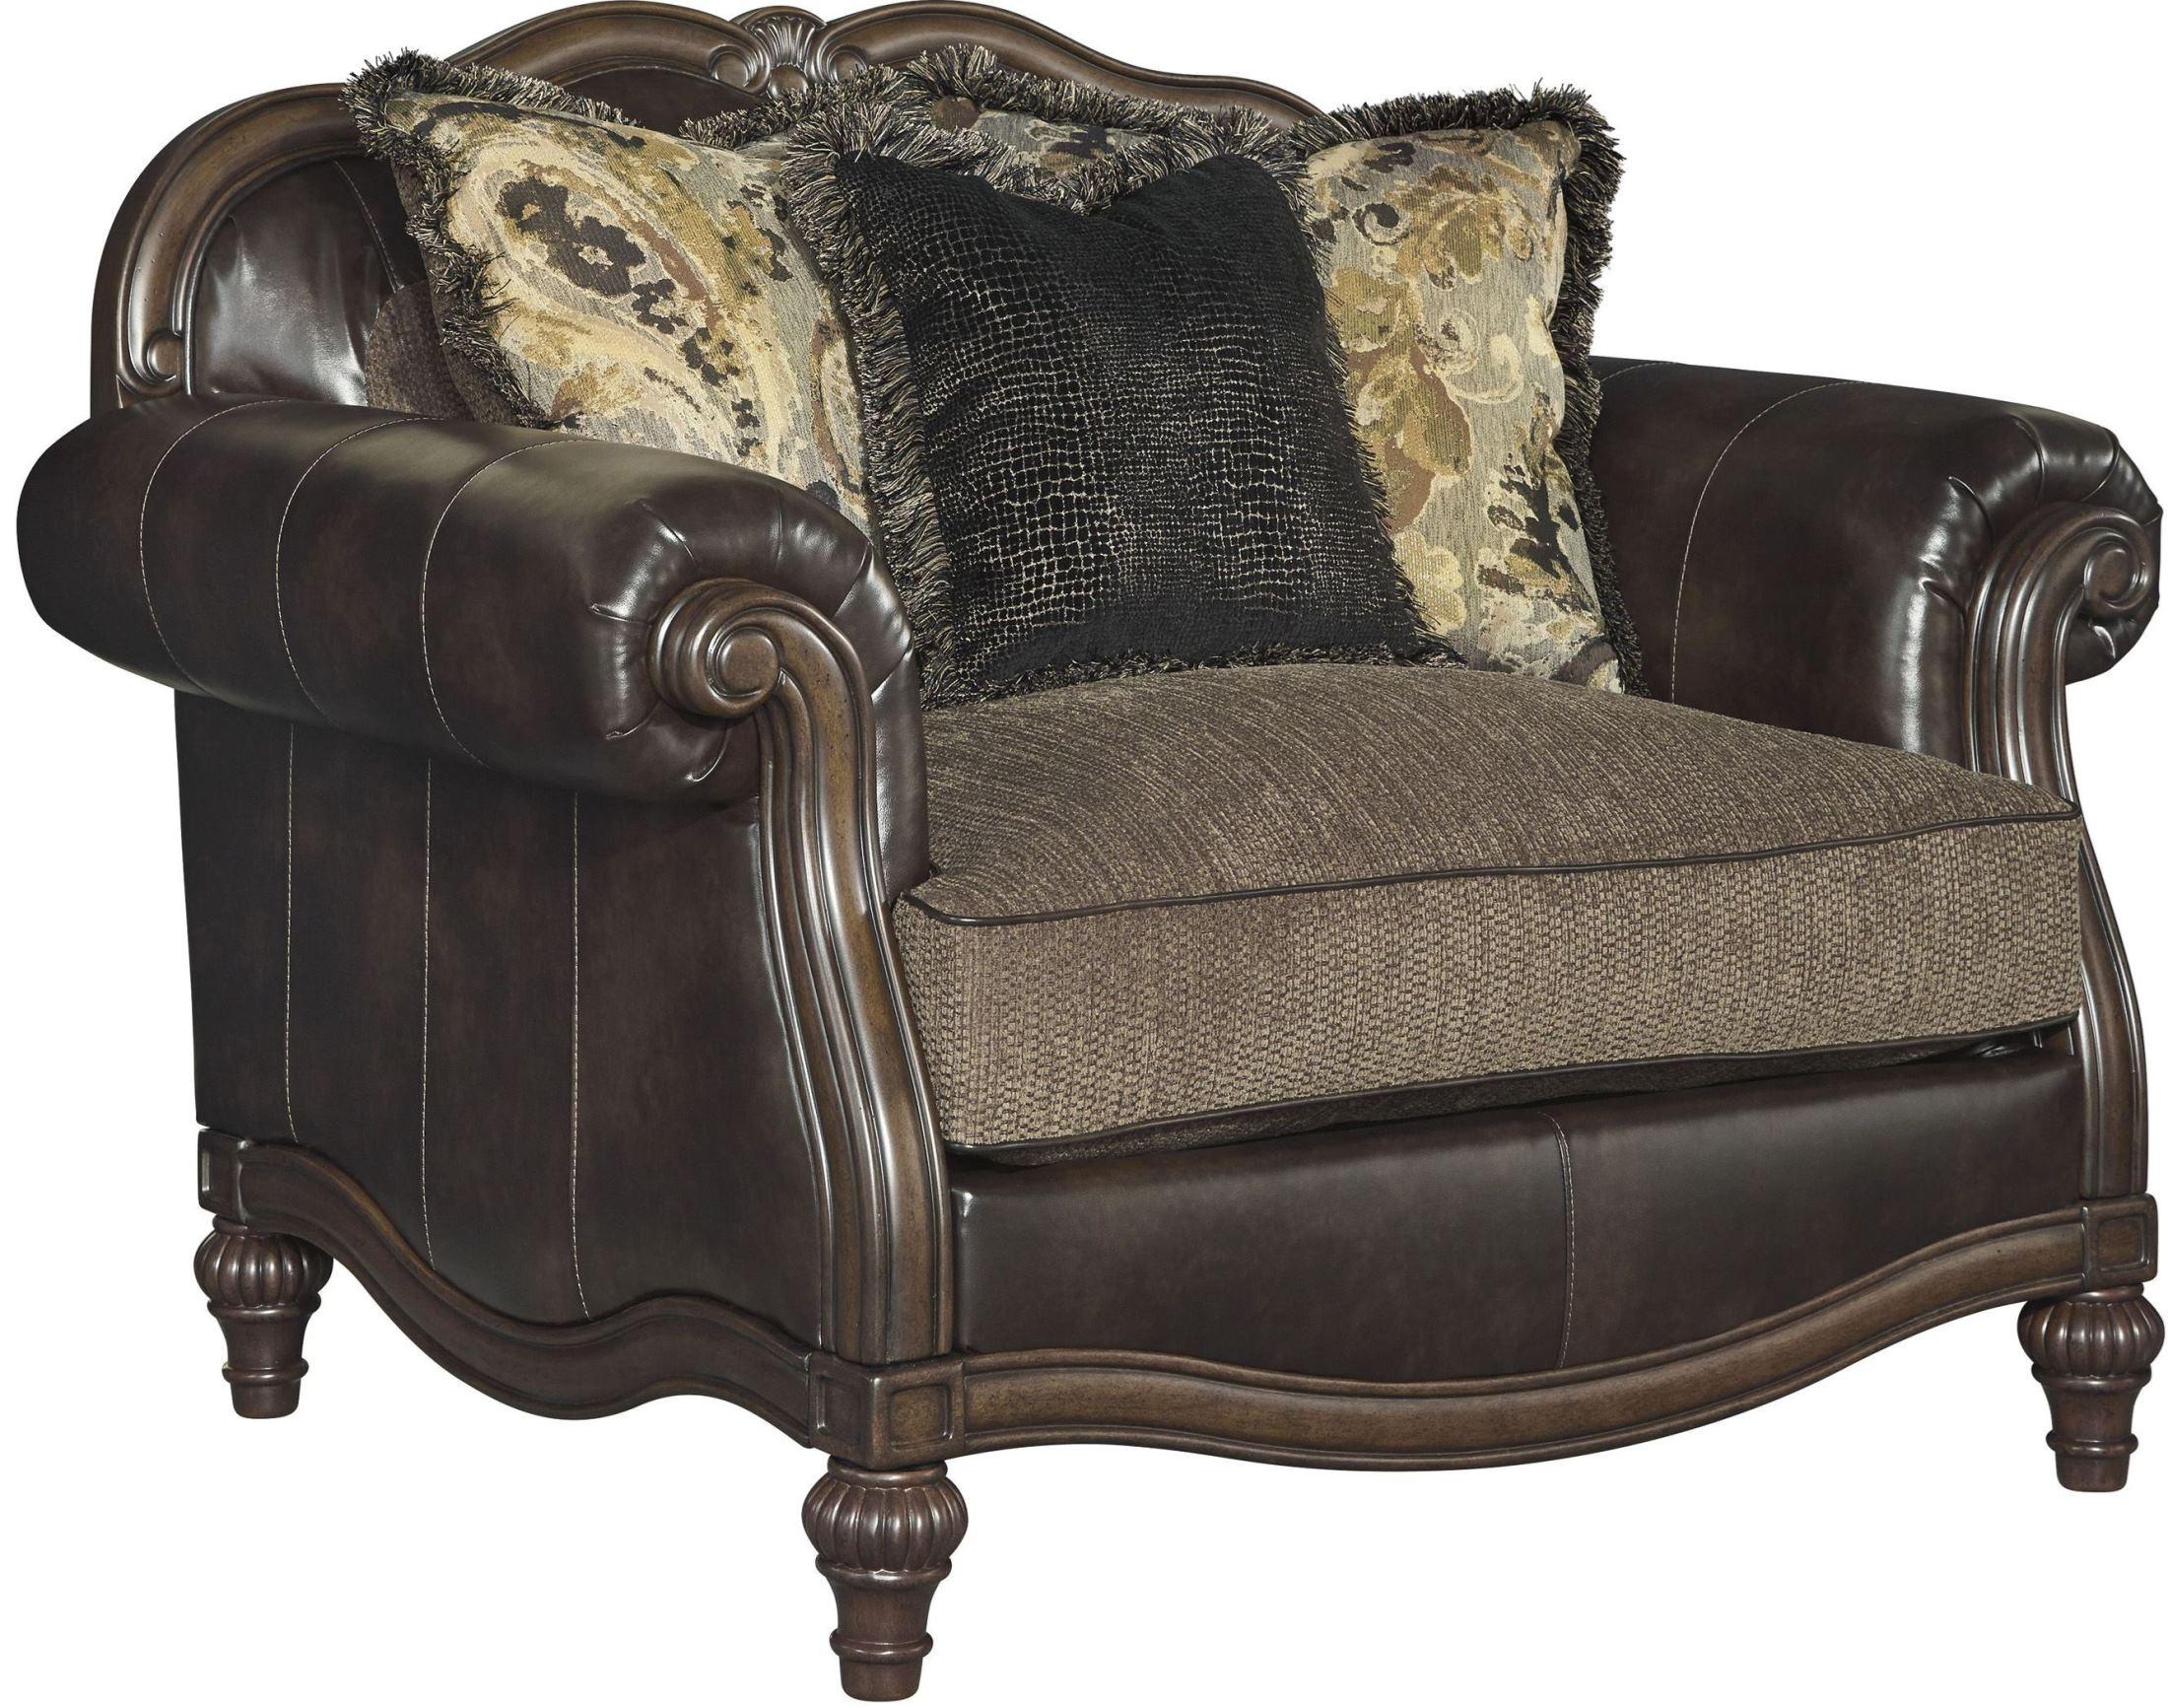 one and a half chair round comfy winnsboro durablend vintage 5560223 ashley